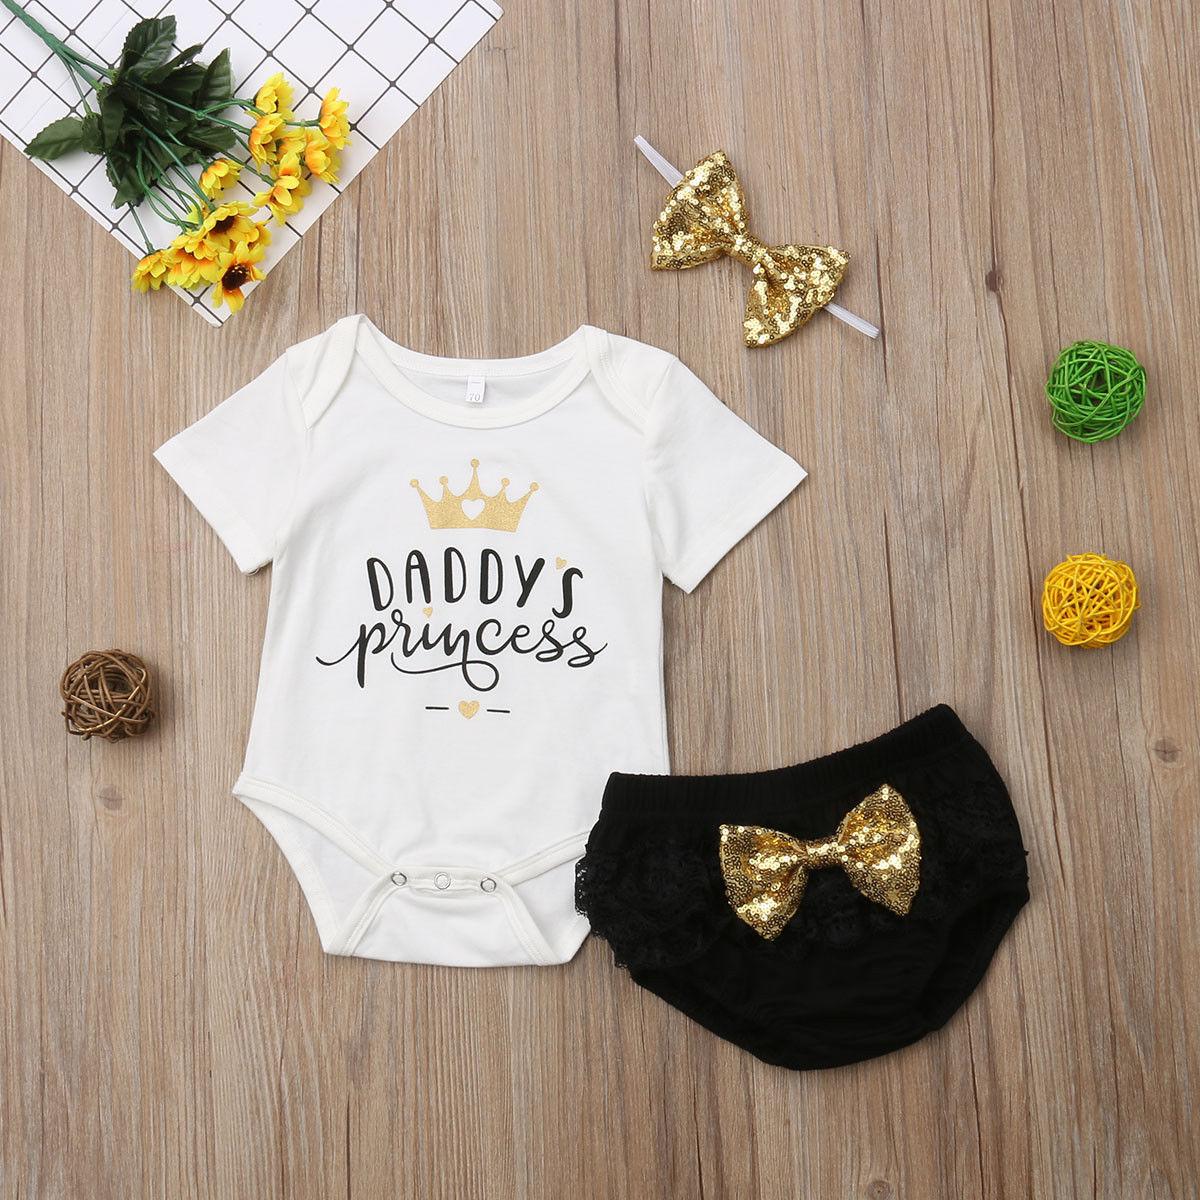 0-18M Daddy's Princess Newborn Baby Girls Romper+Tulle Pants Headband Summer Fashion Letter Print Breathable Infant Bodysuit Set